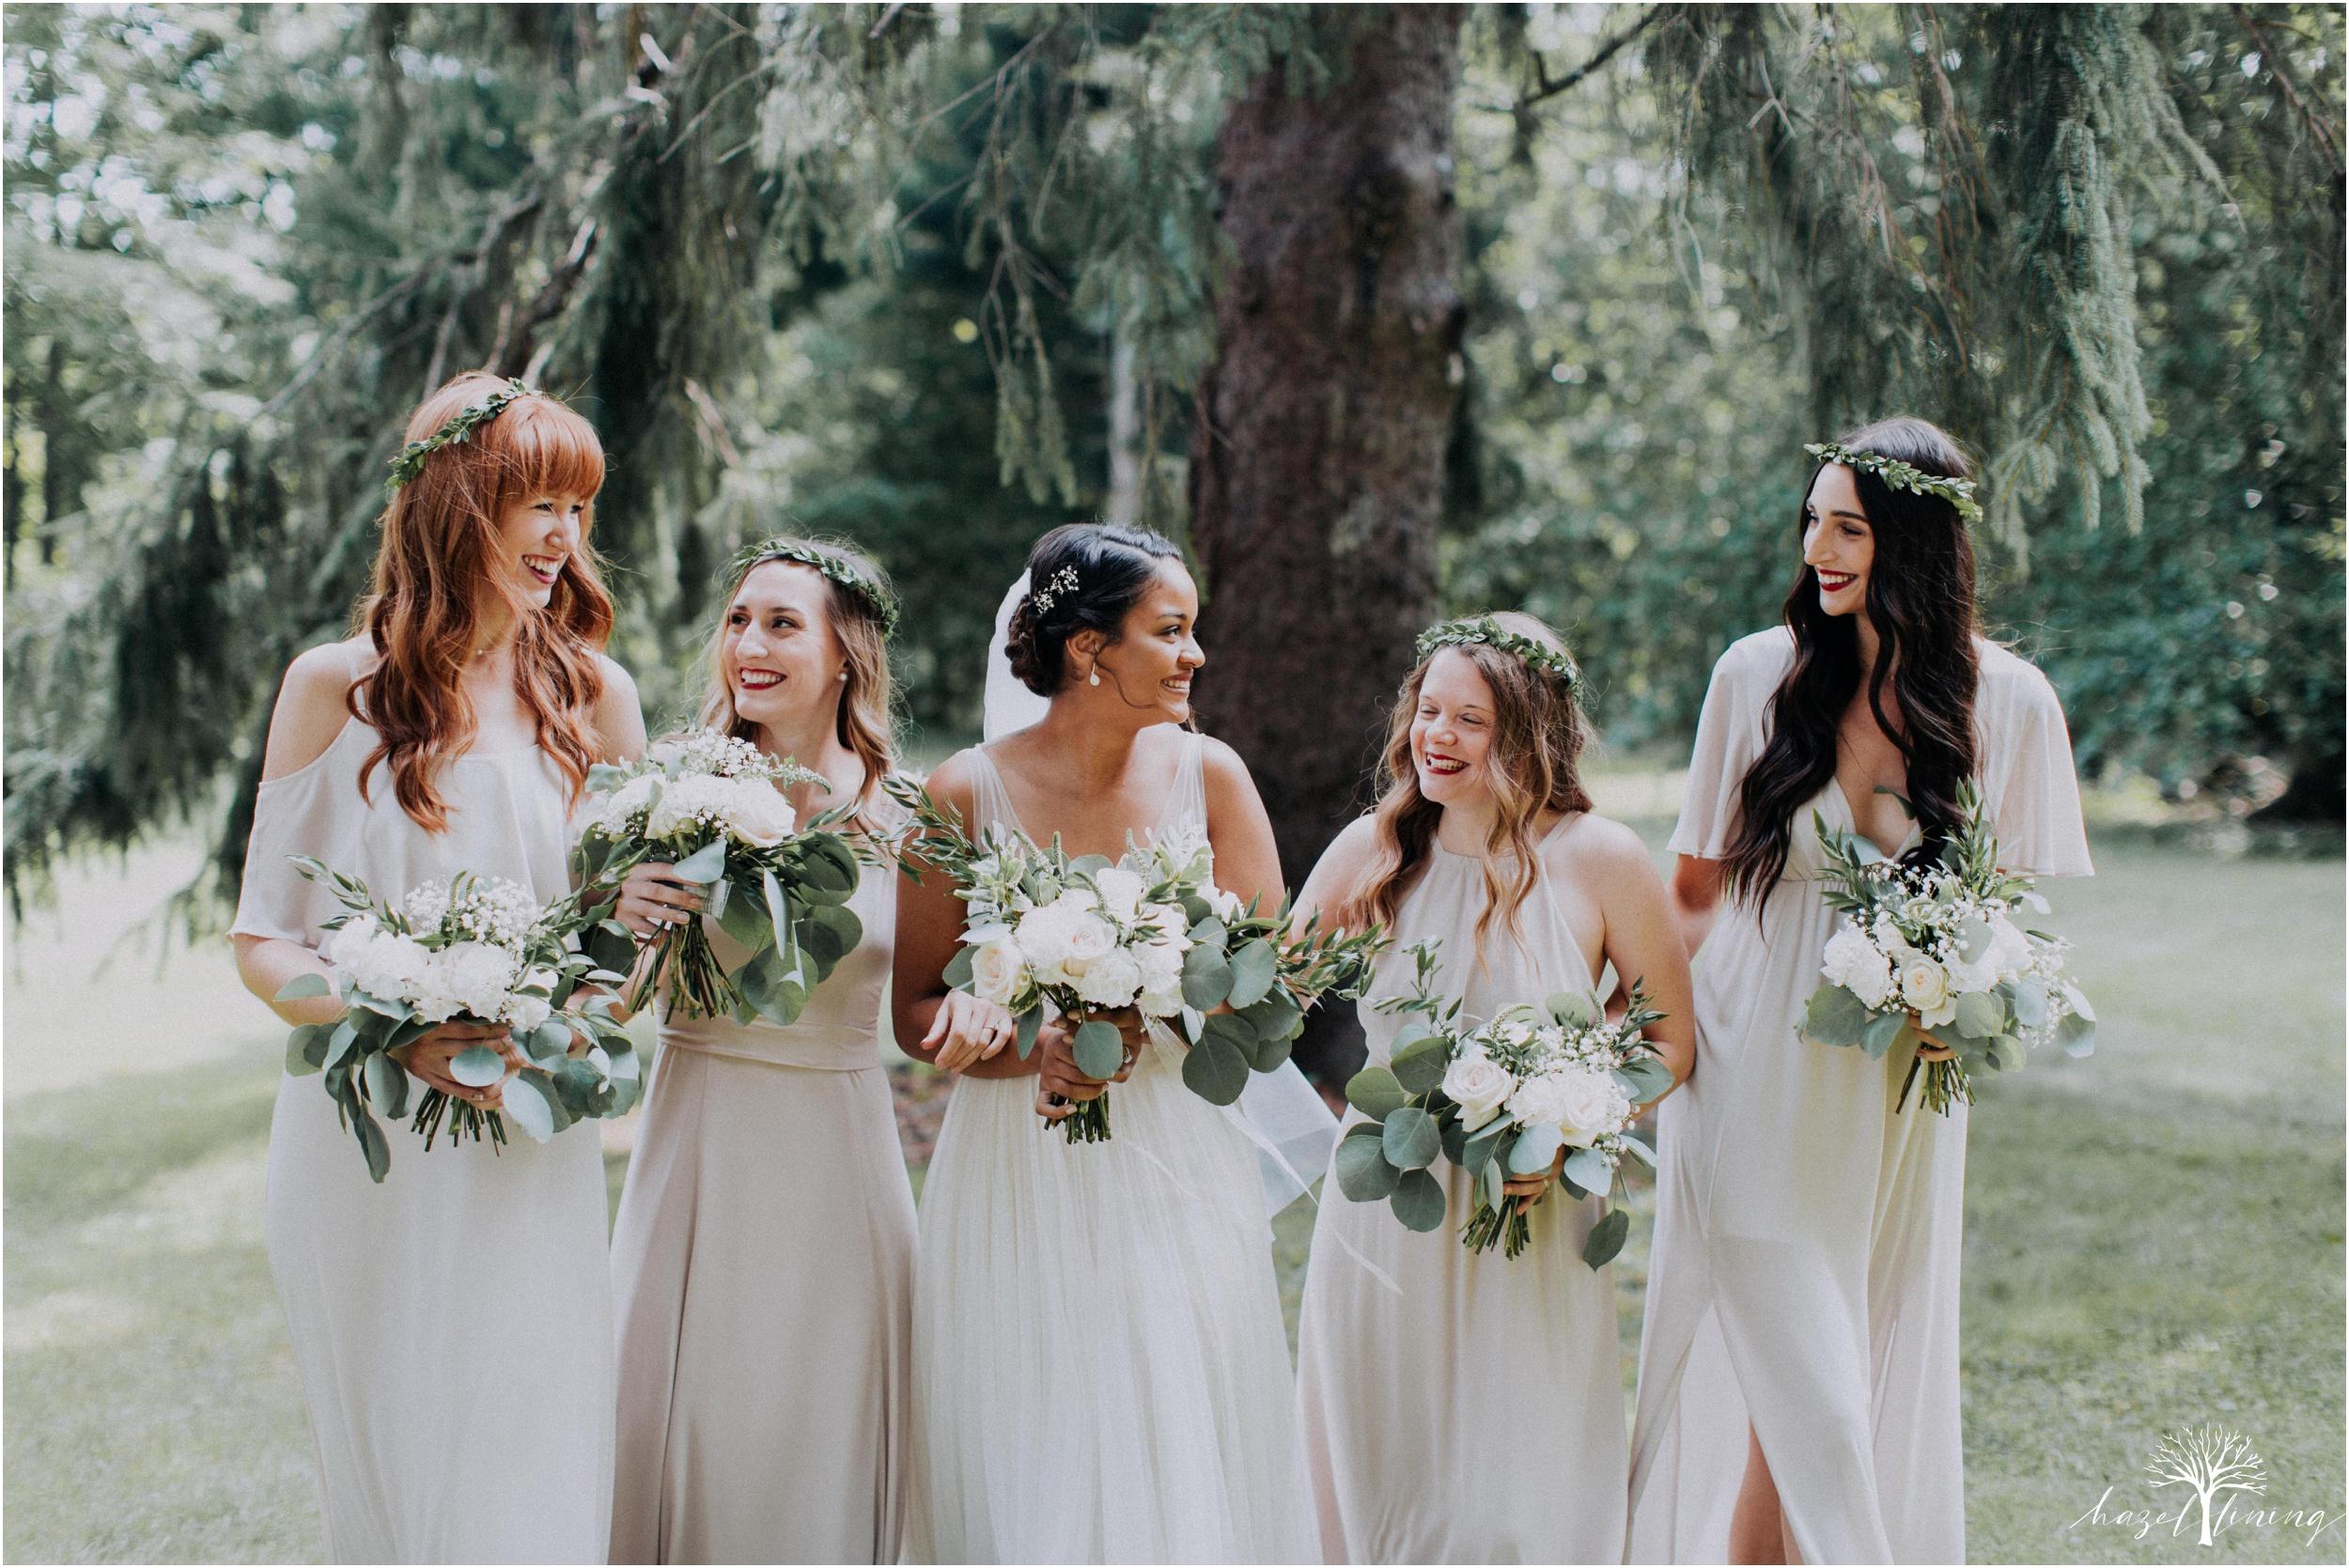 mariah-kreyling-samuel-sherratt-sherrattwiththeworld-peirce-farm-at-witch-hill-boston-massachusetts-wedding-photography-hazel-lining-travel-wedding-elopement-photography_0042.jpg